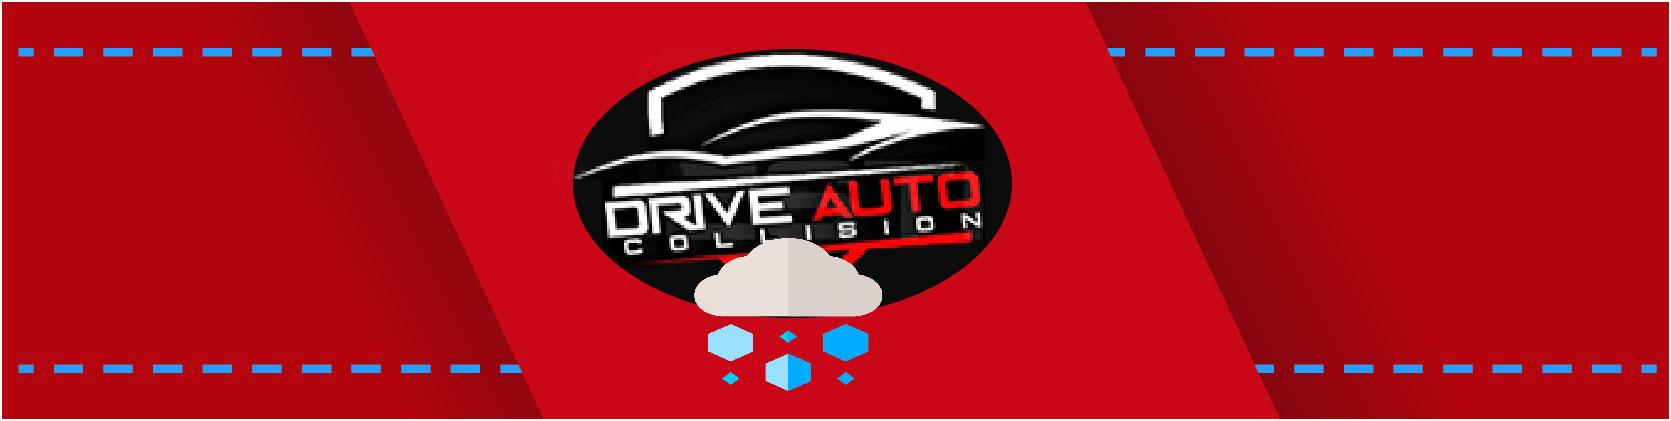 Drive-Auto-Collision_Iconssss-02